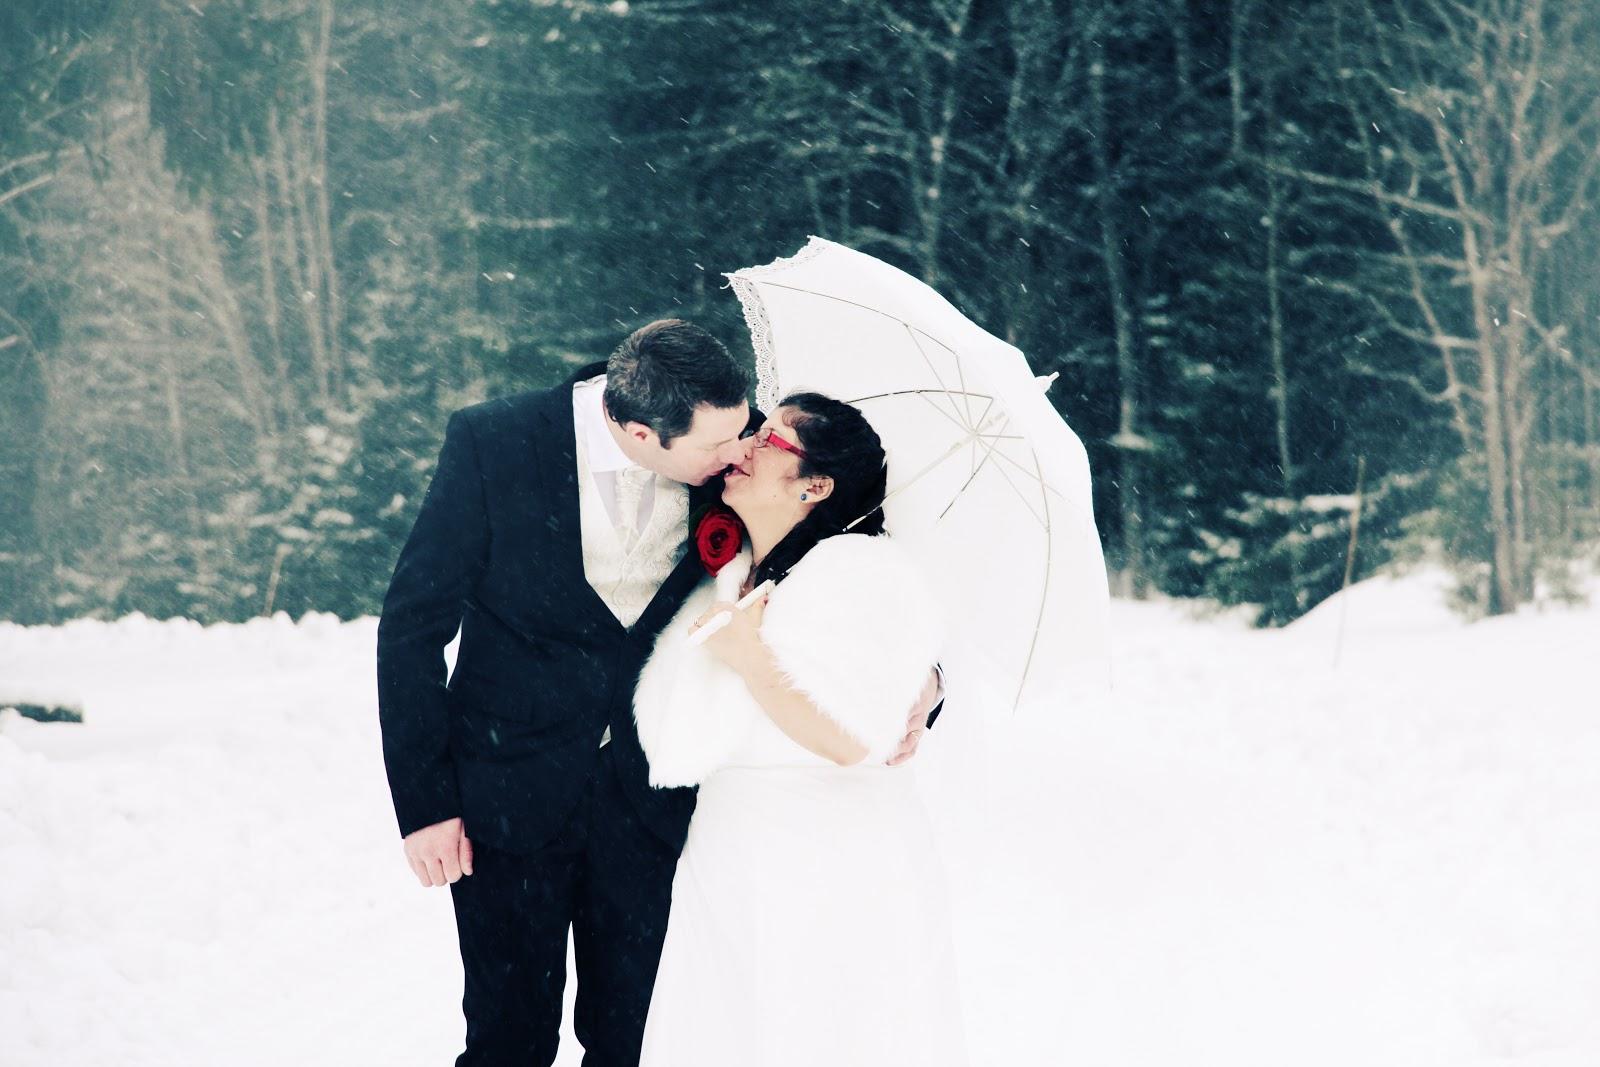 Fotograf Härnösand bröllopsfotograf Maria-Thérèse Sommar snow höga kusten sundsvall sollefteå umeå kramfors vinterbröllop winter wedding